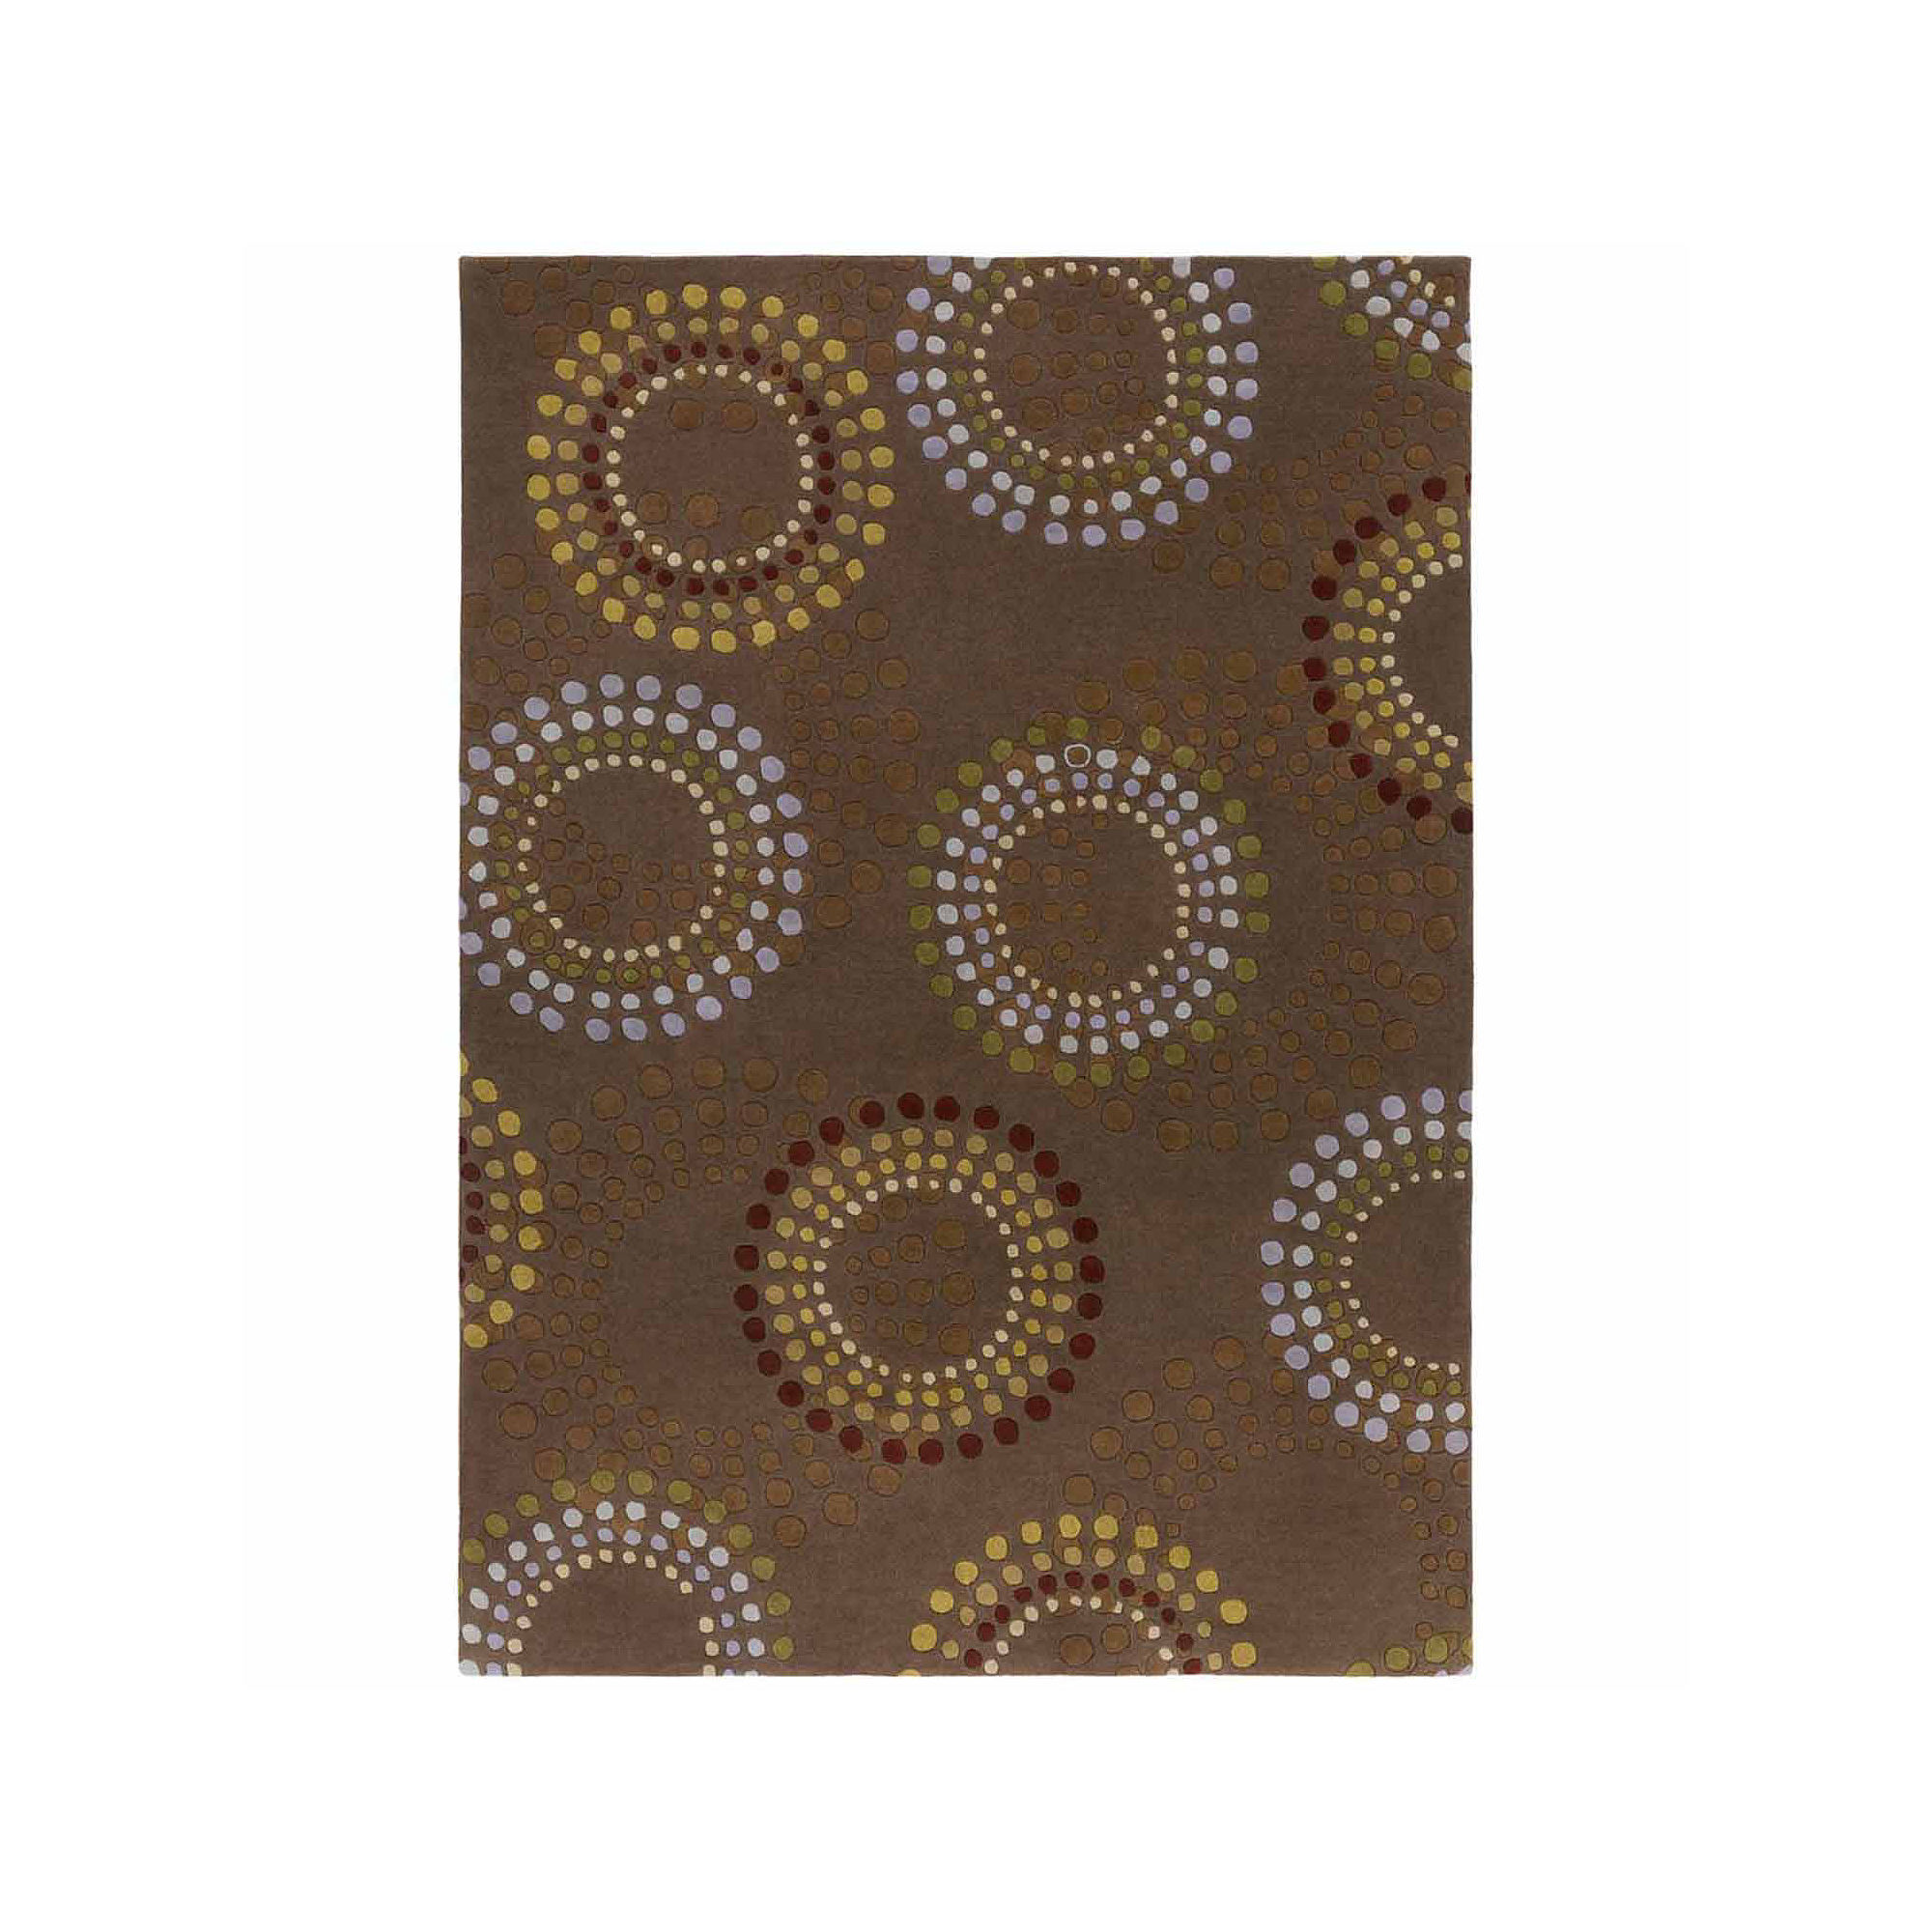 Decor 140 Oban Hand Tufted Rectangular Rugs